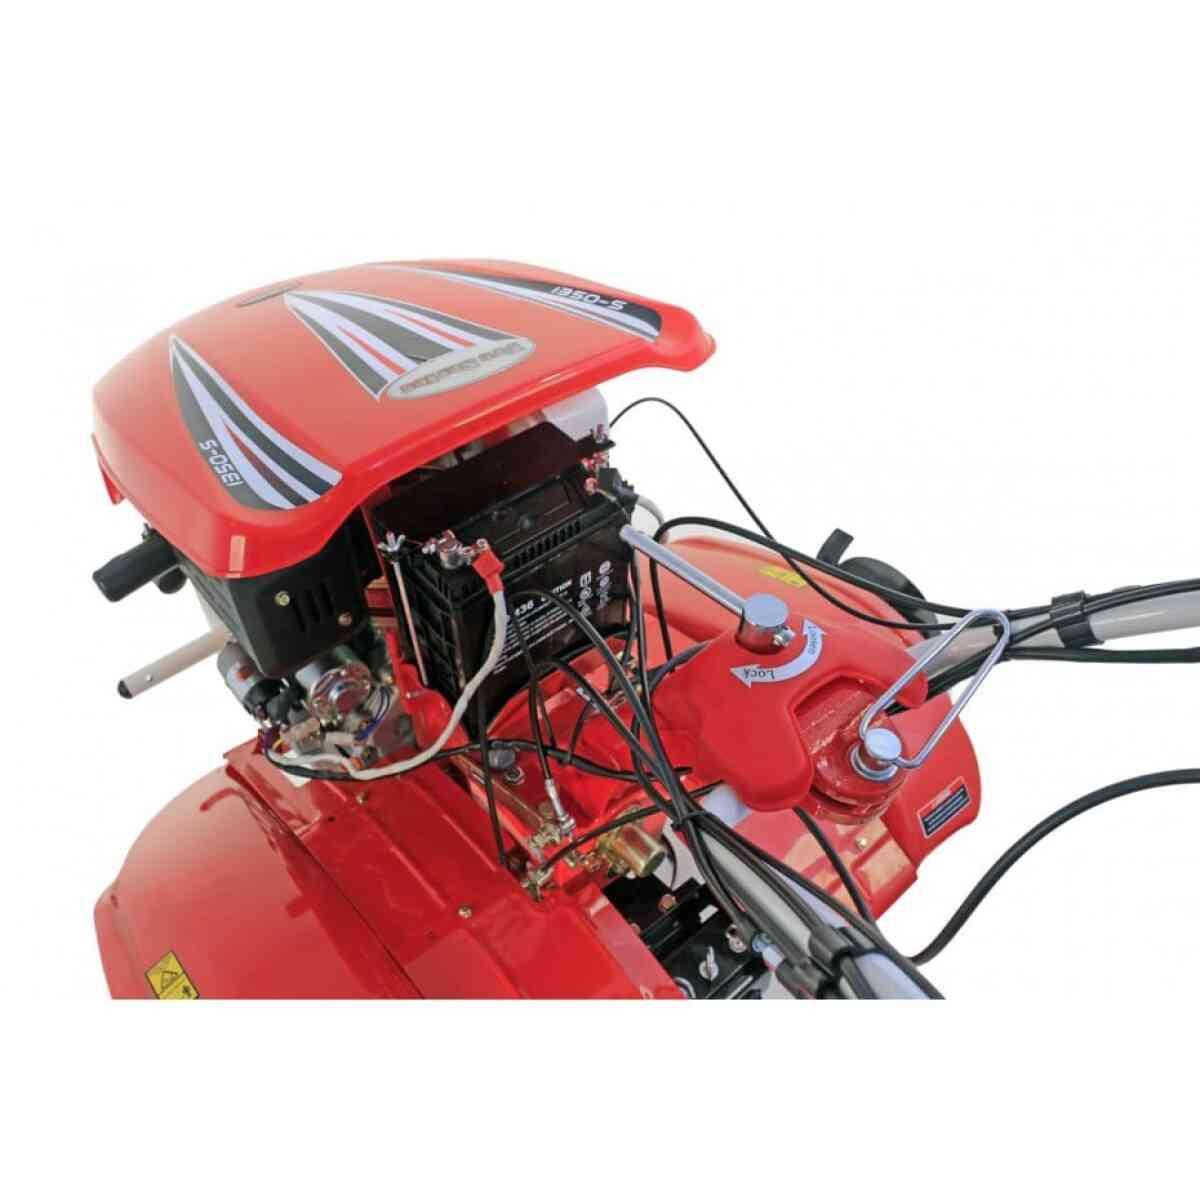 motocultor pro series new 1350 s o mac.ro 10 1 48